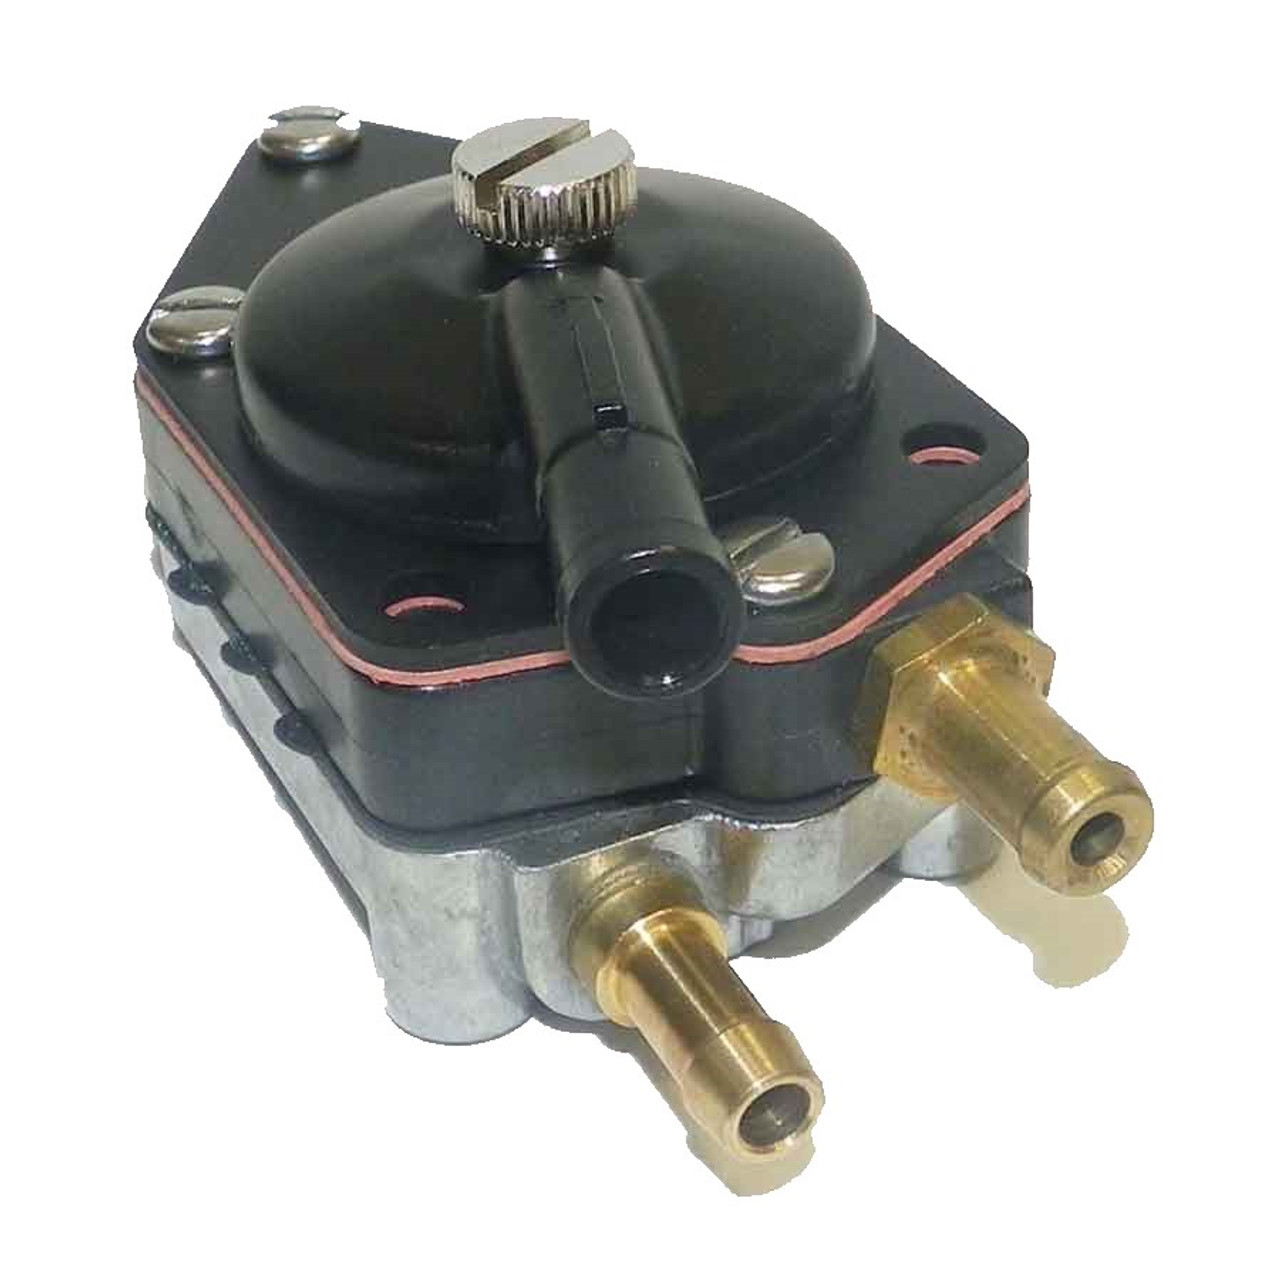 New WSM Brand Johnson/Evinrude 6 / 8 / 25 - 235 HP Fuel Pump [OEM 438559]